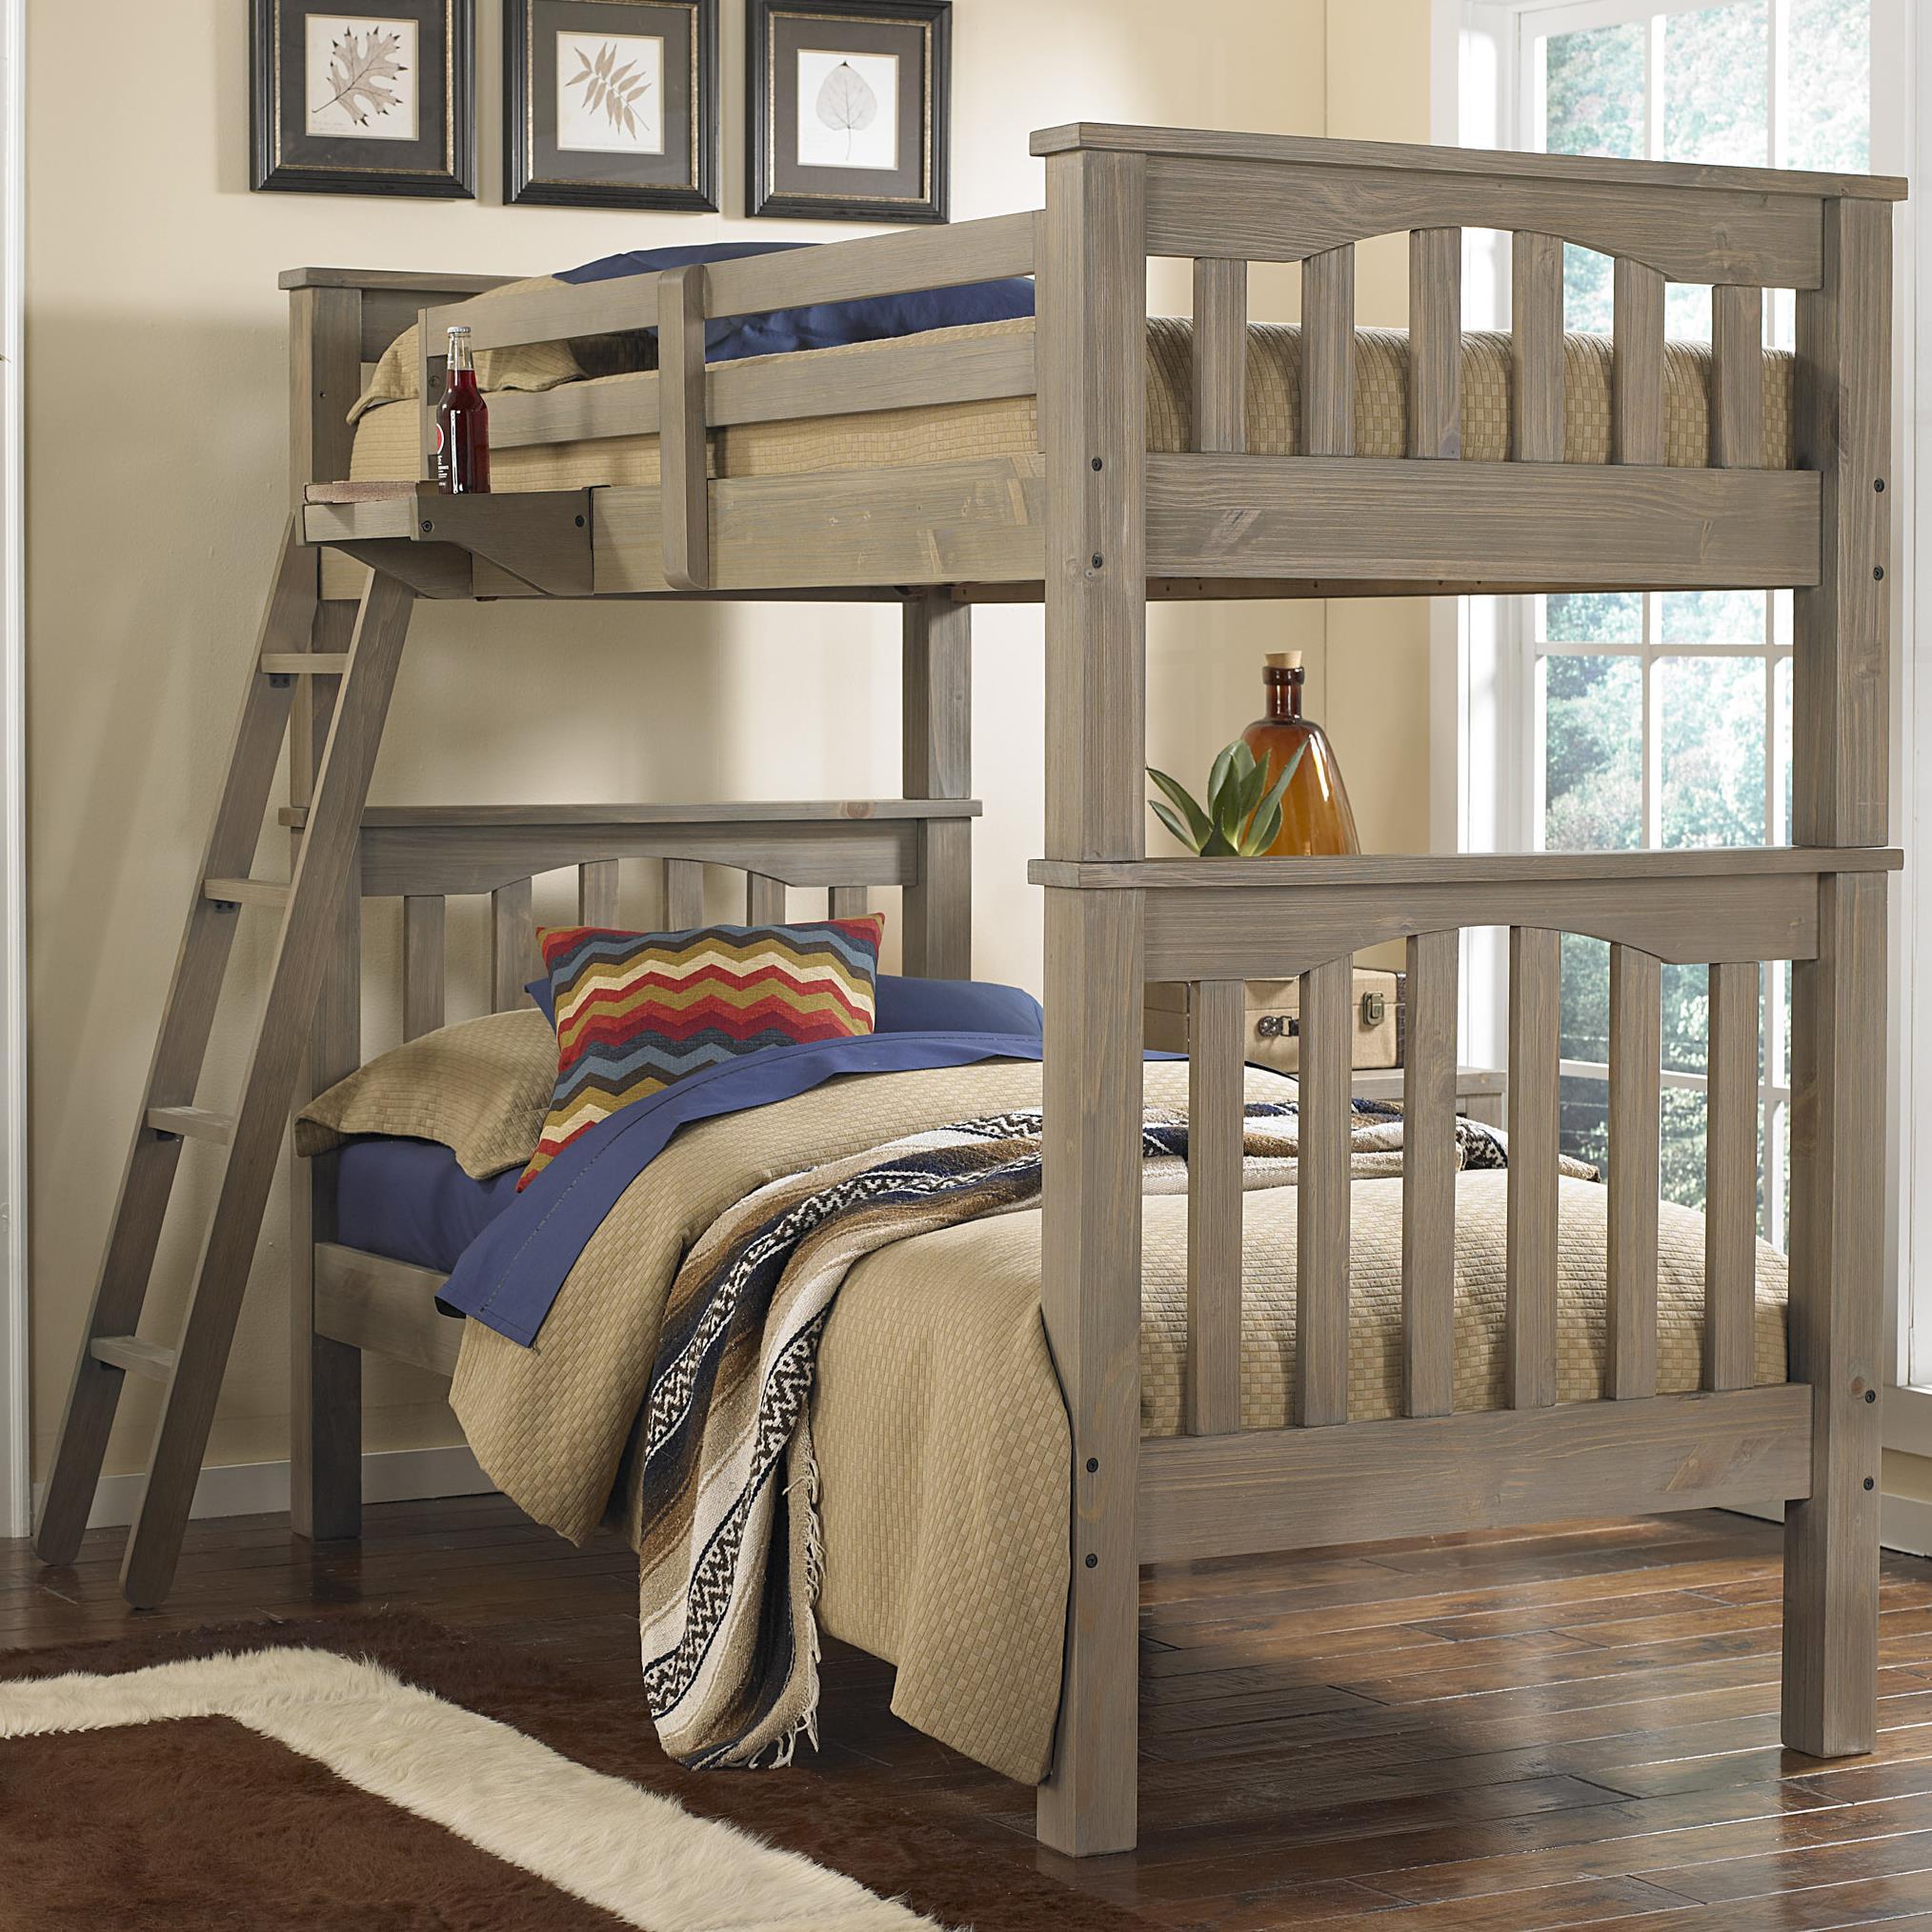 NE Kids HighlandsTwin Over Twin Harper Bunk Bed